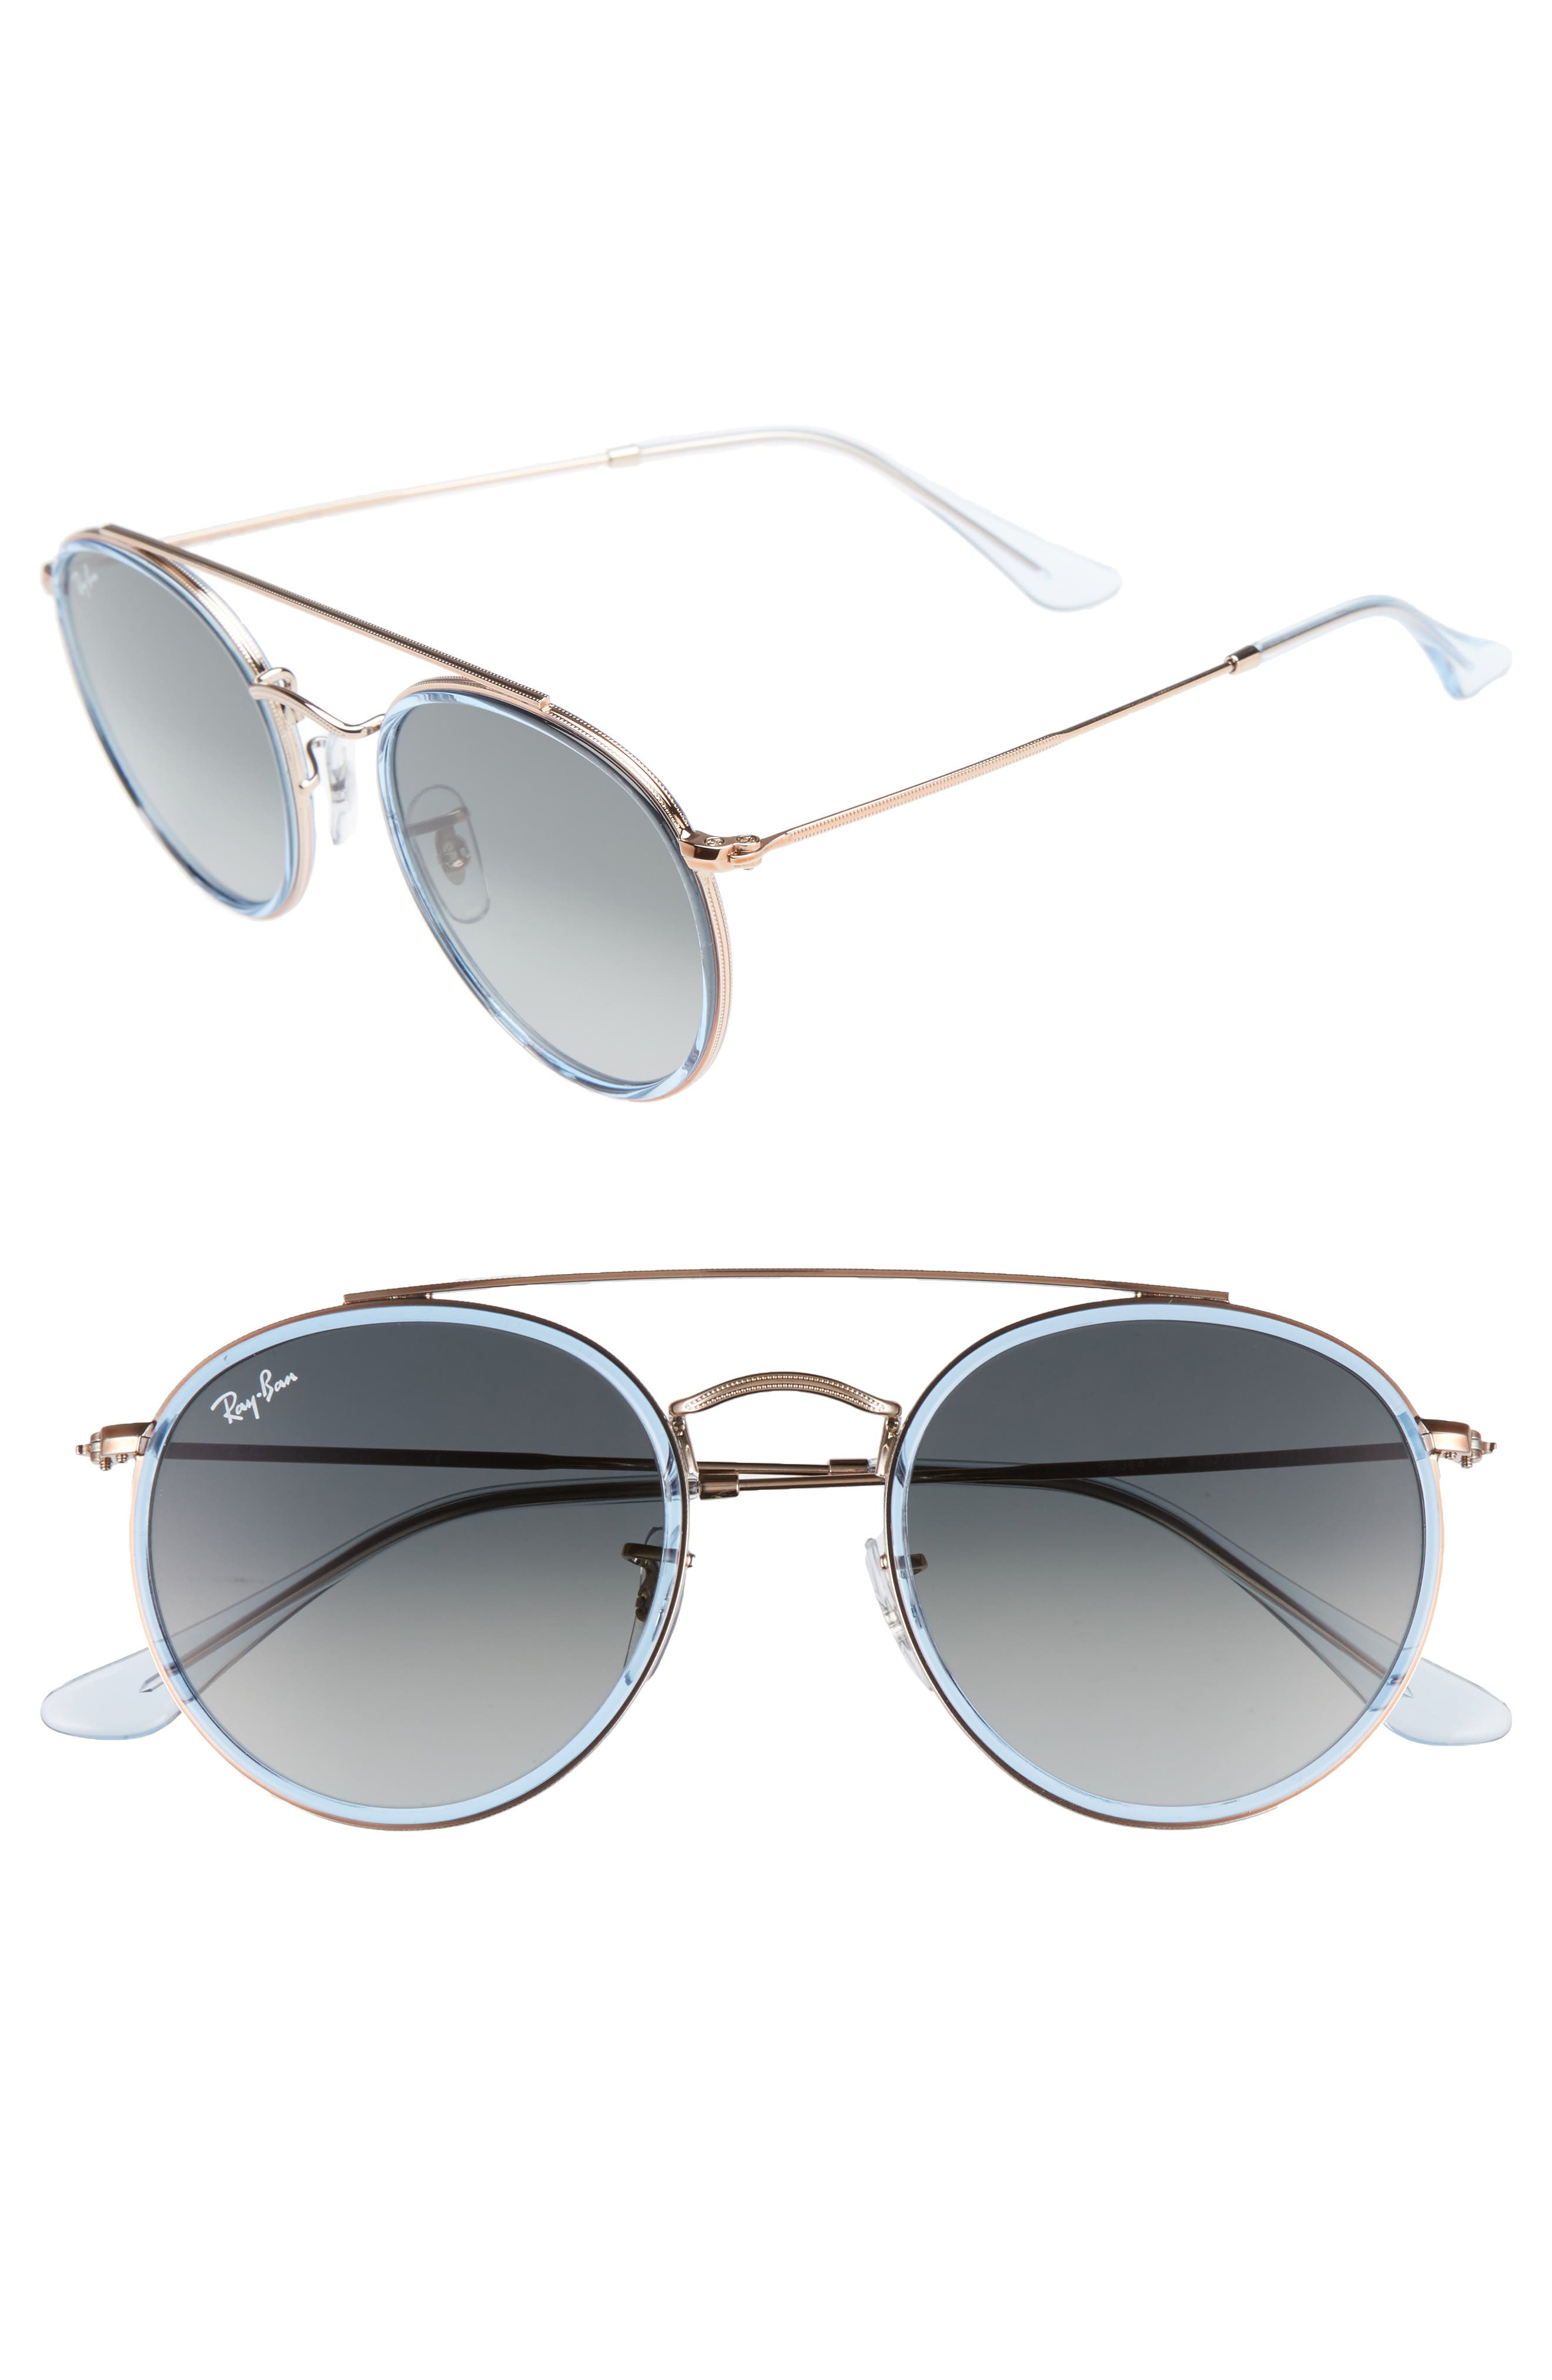 51mm Aviator Gradient Lens Sunglasses,                             Alternate thumbnail 6, color,